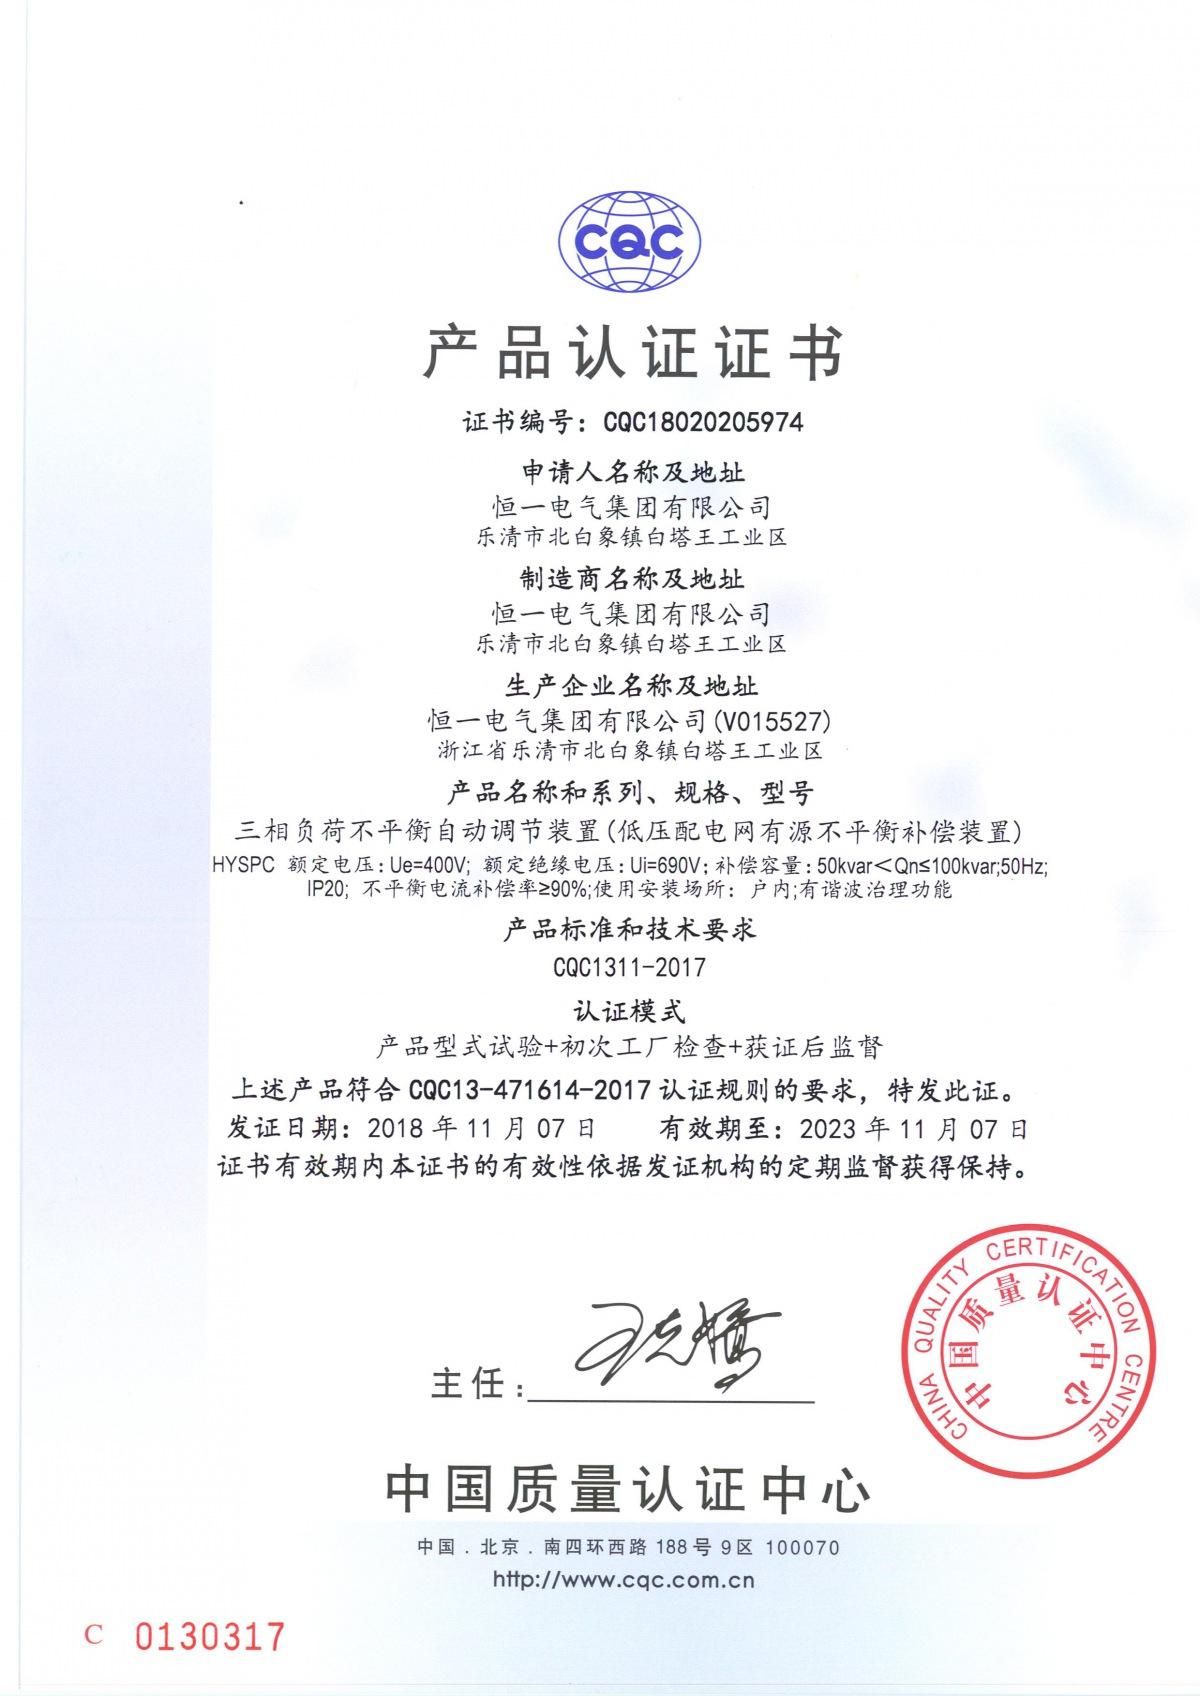 HYSPC 中文